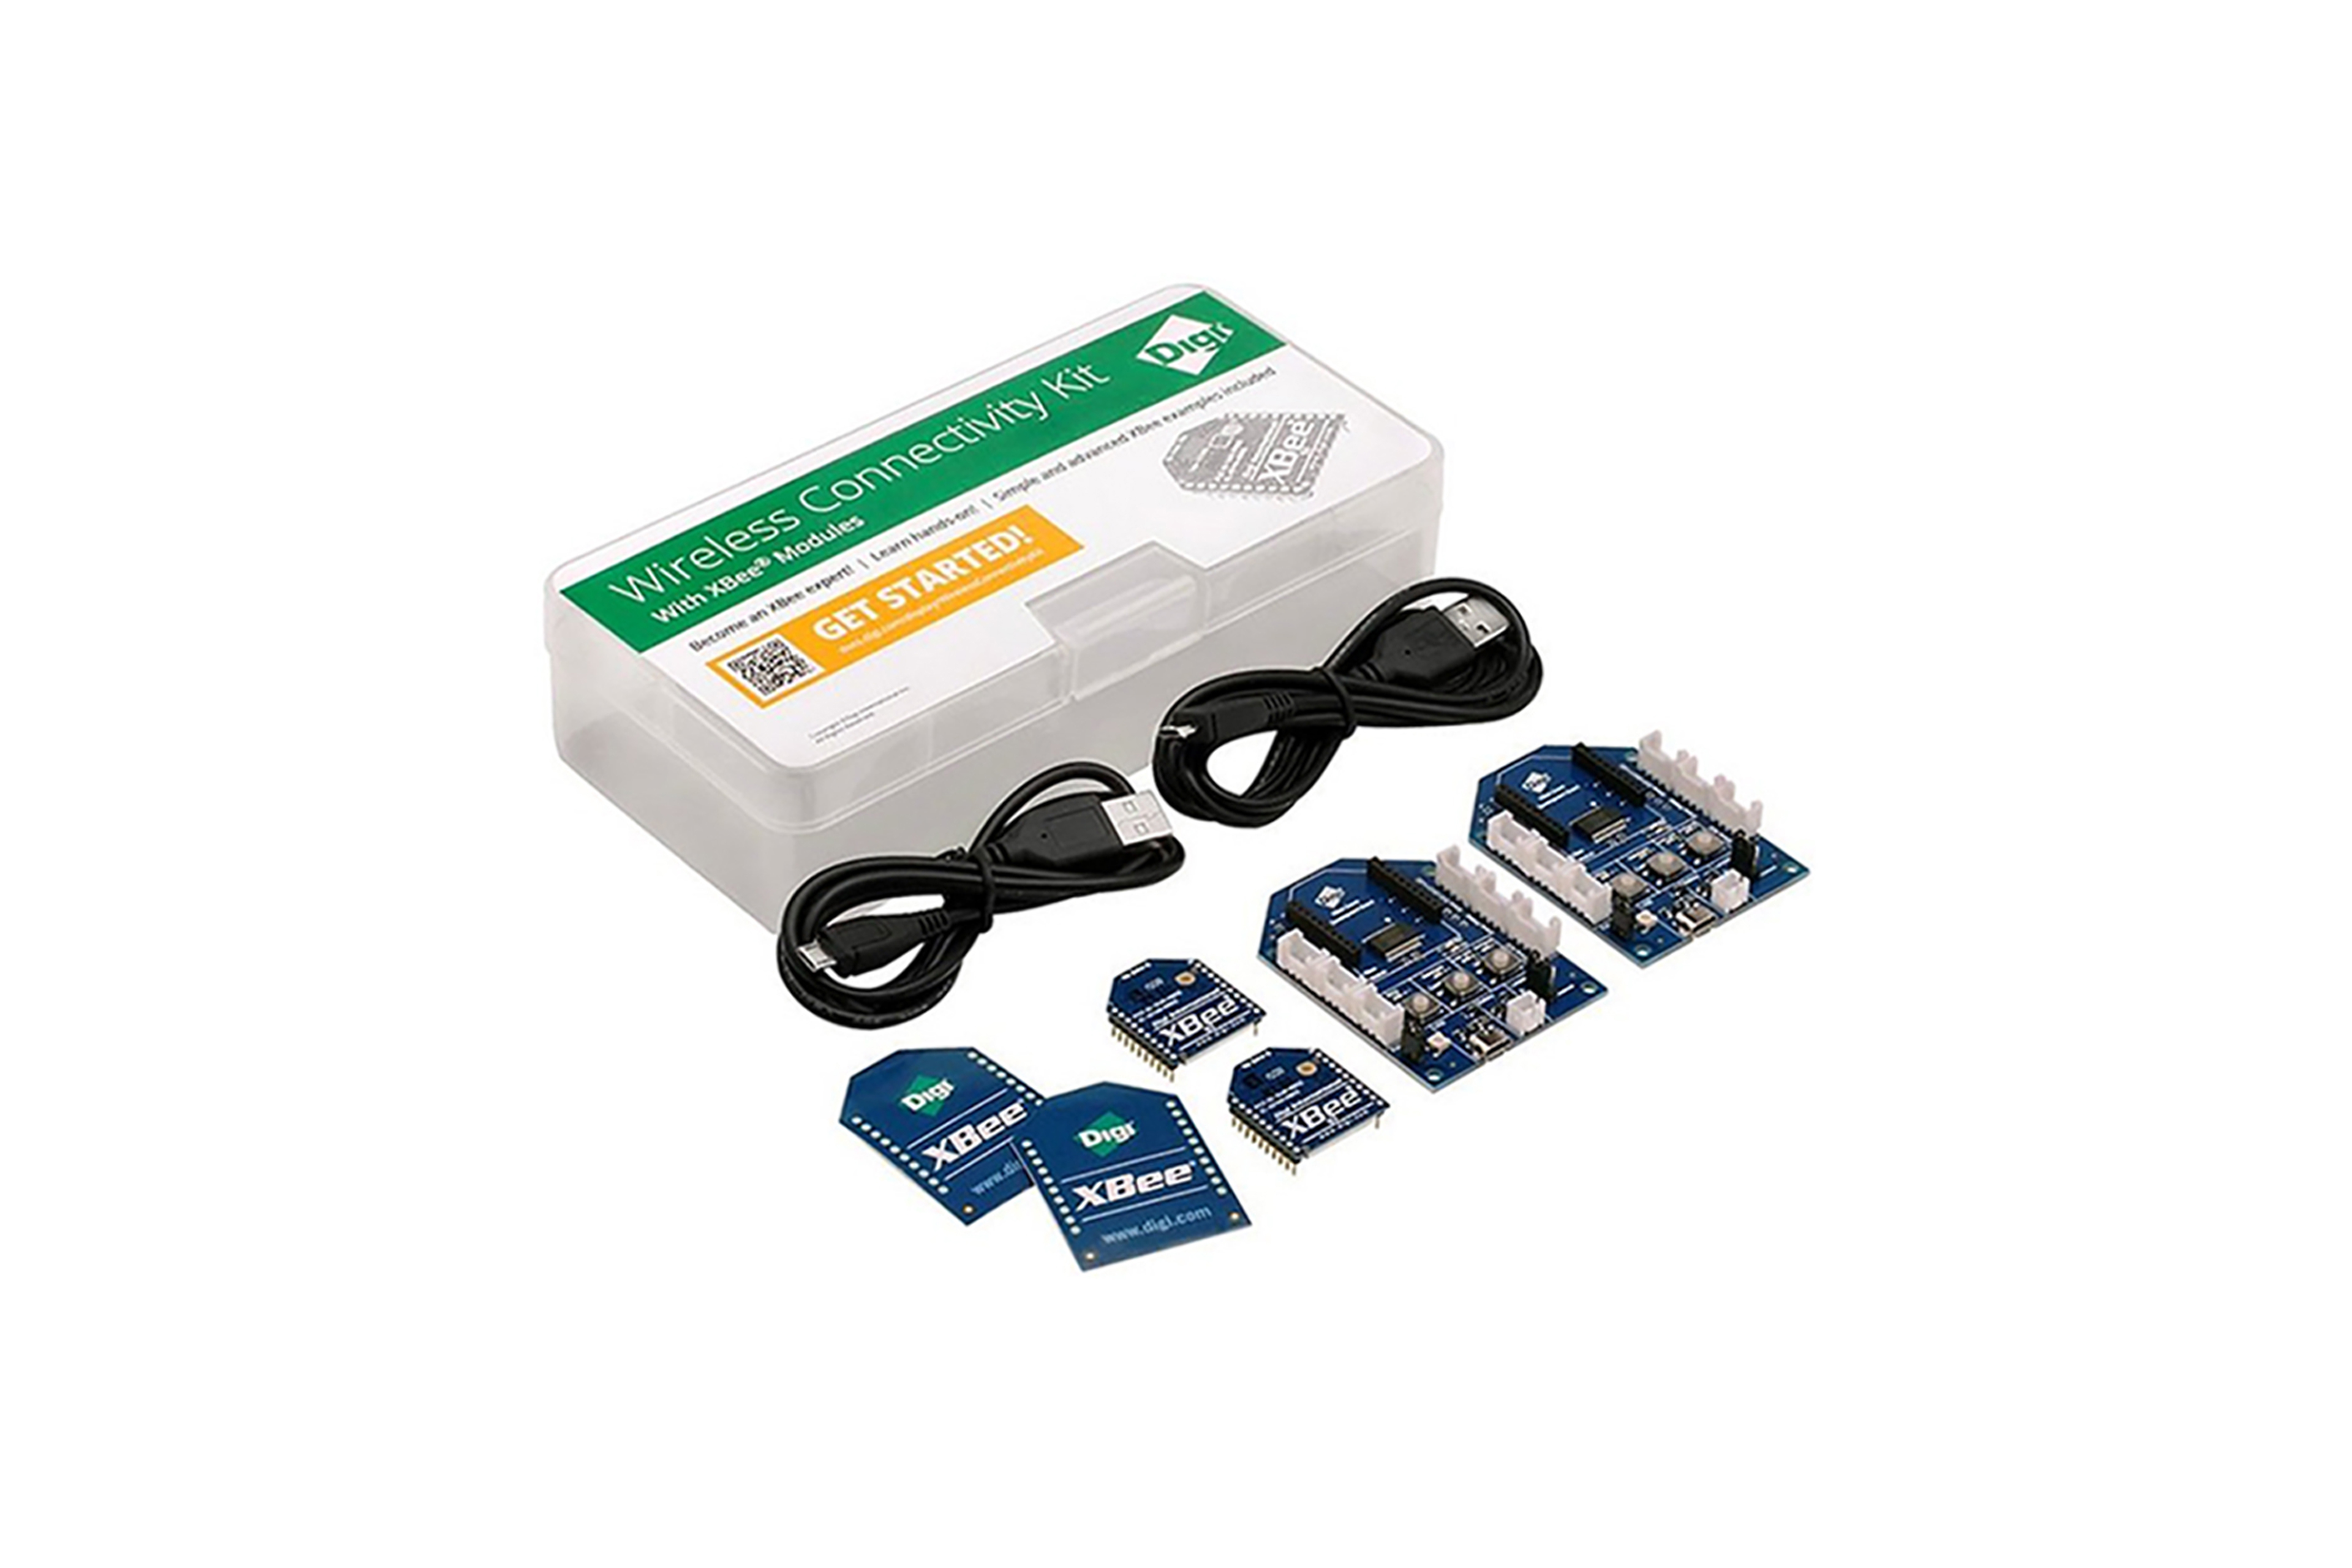 Wireless Connectivity Kit Xbee 802.15.4